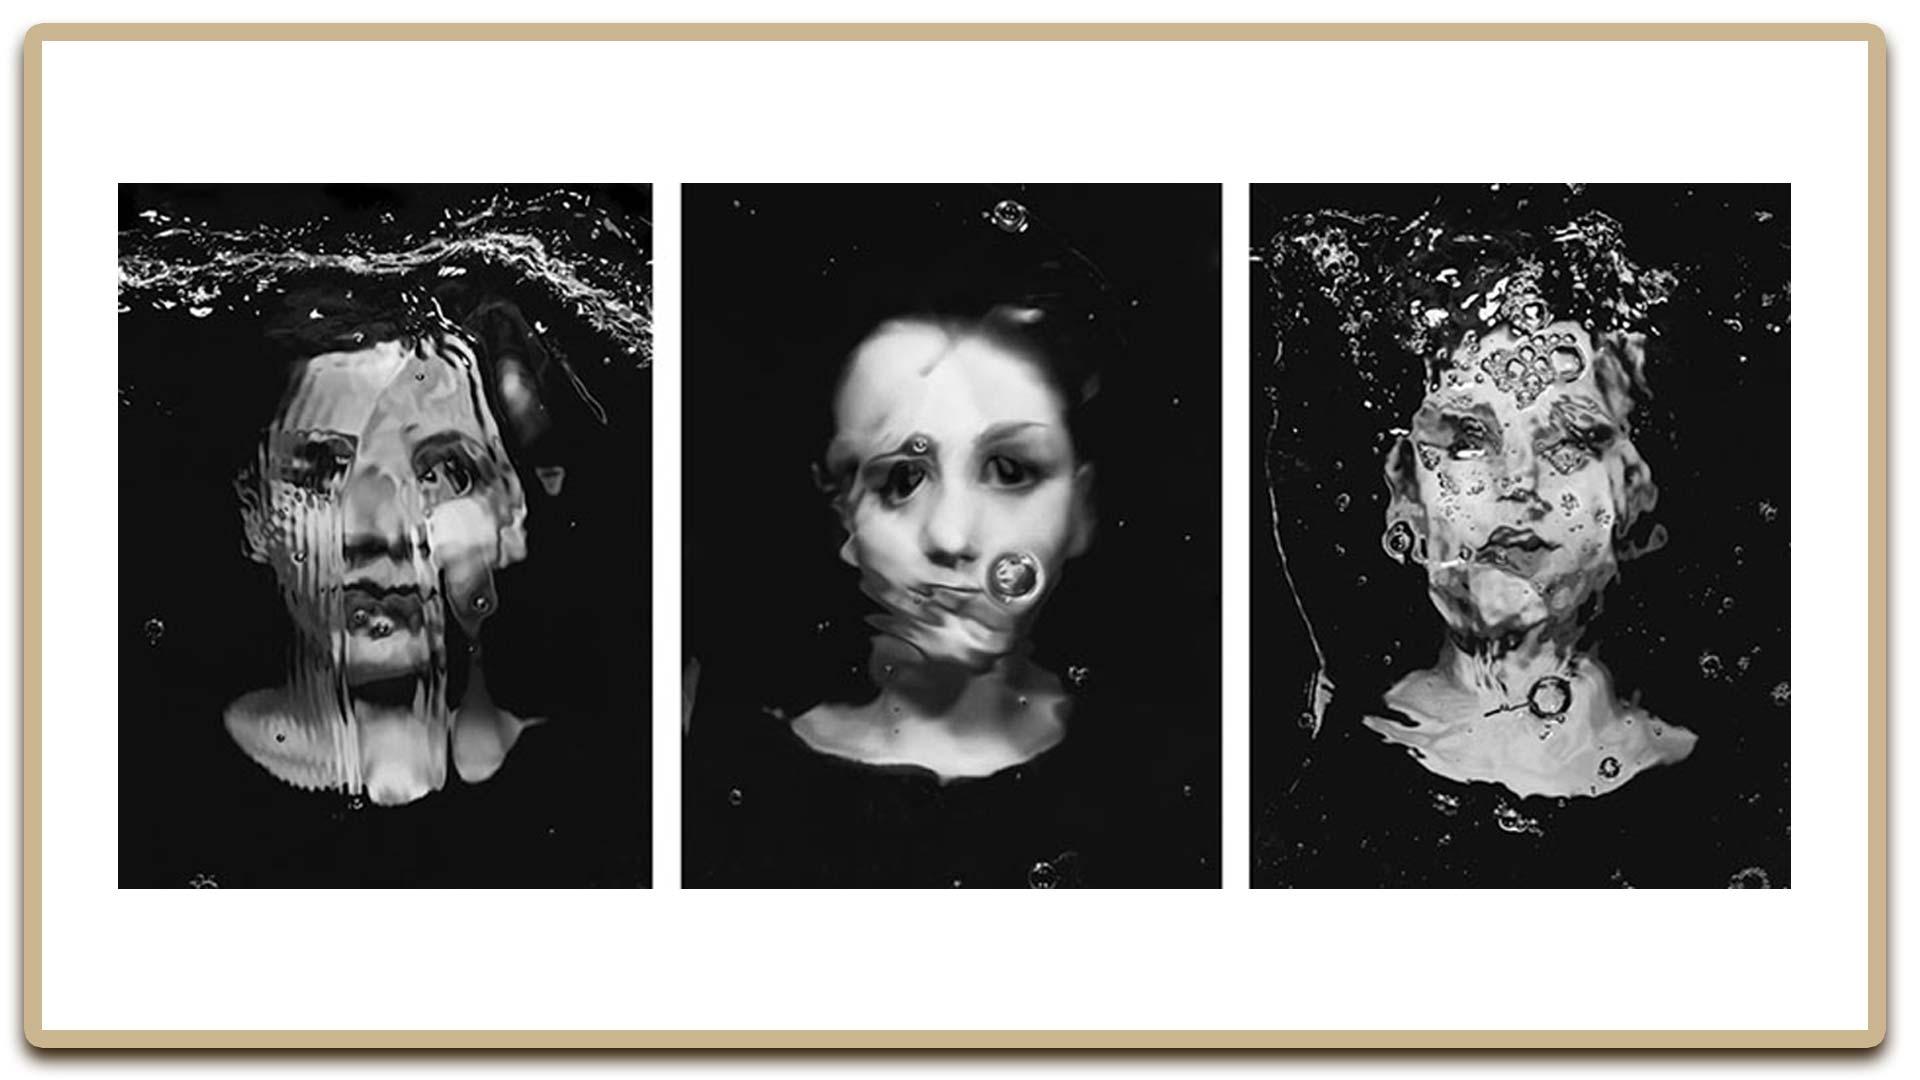 Photomontage sh80jpg - تاریخچه فتومونتاژ